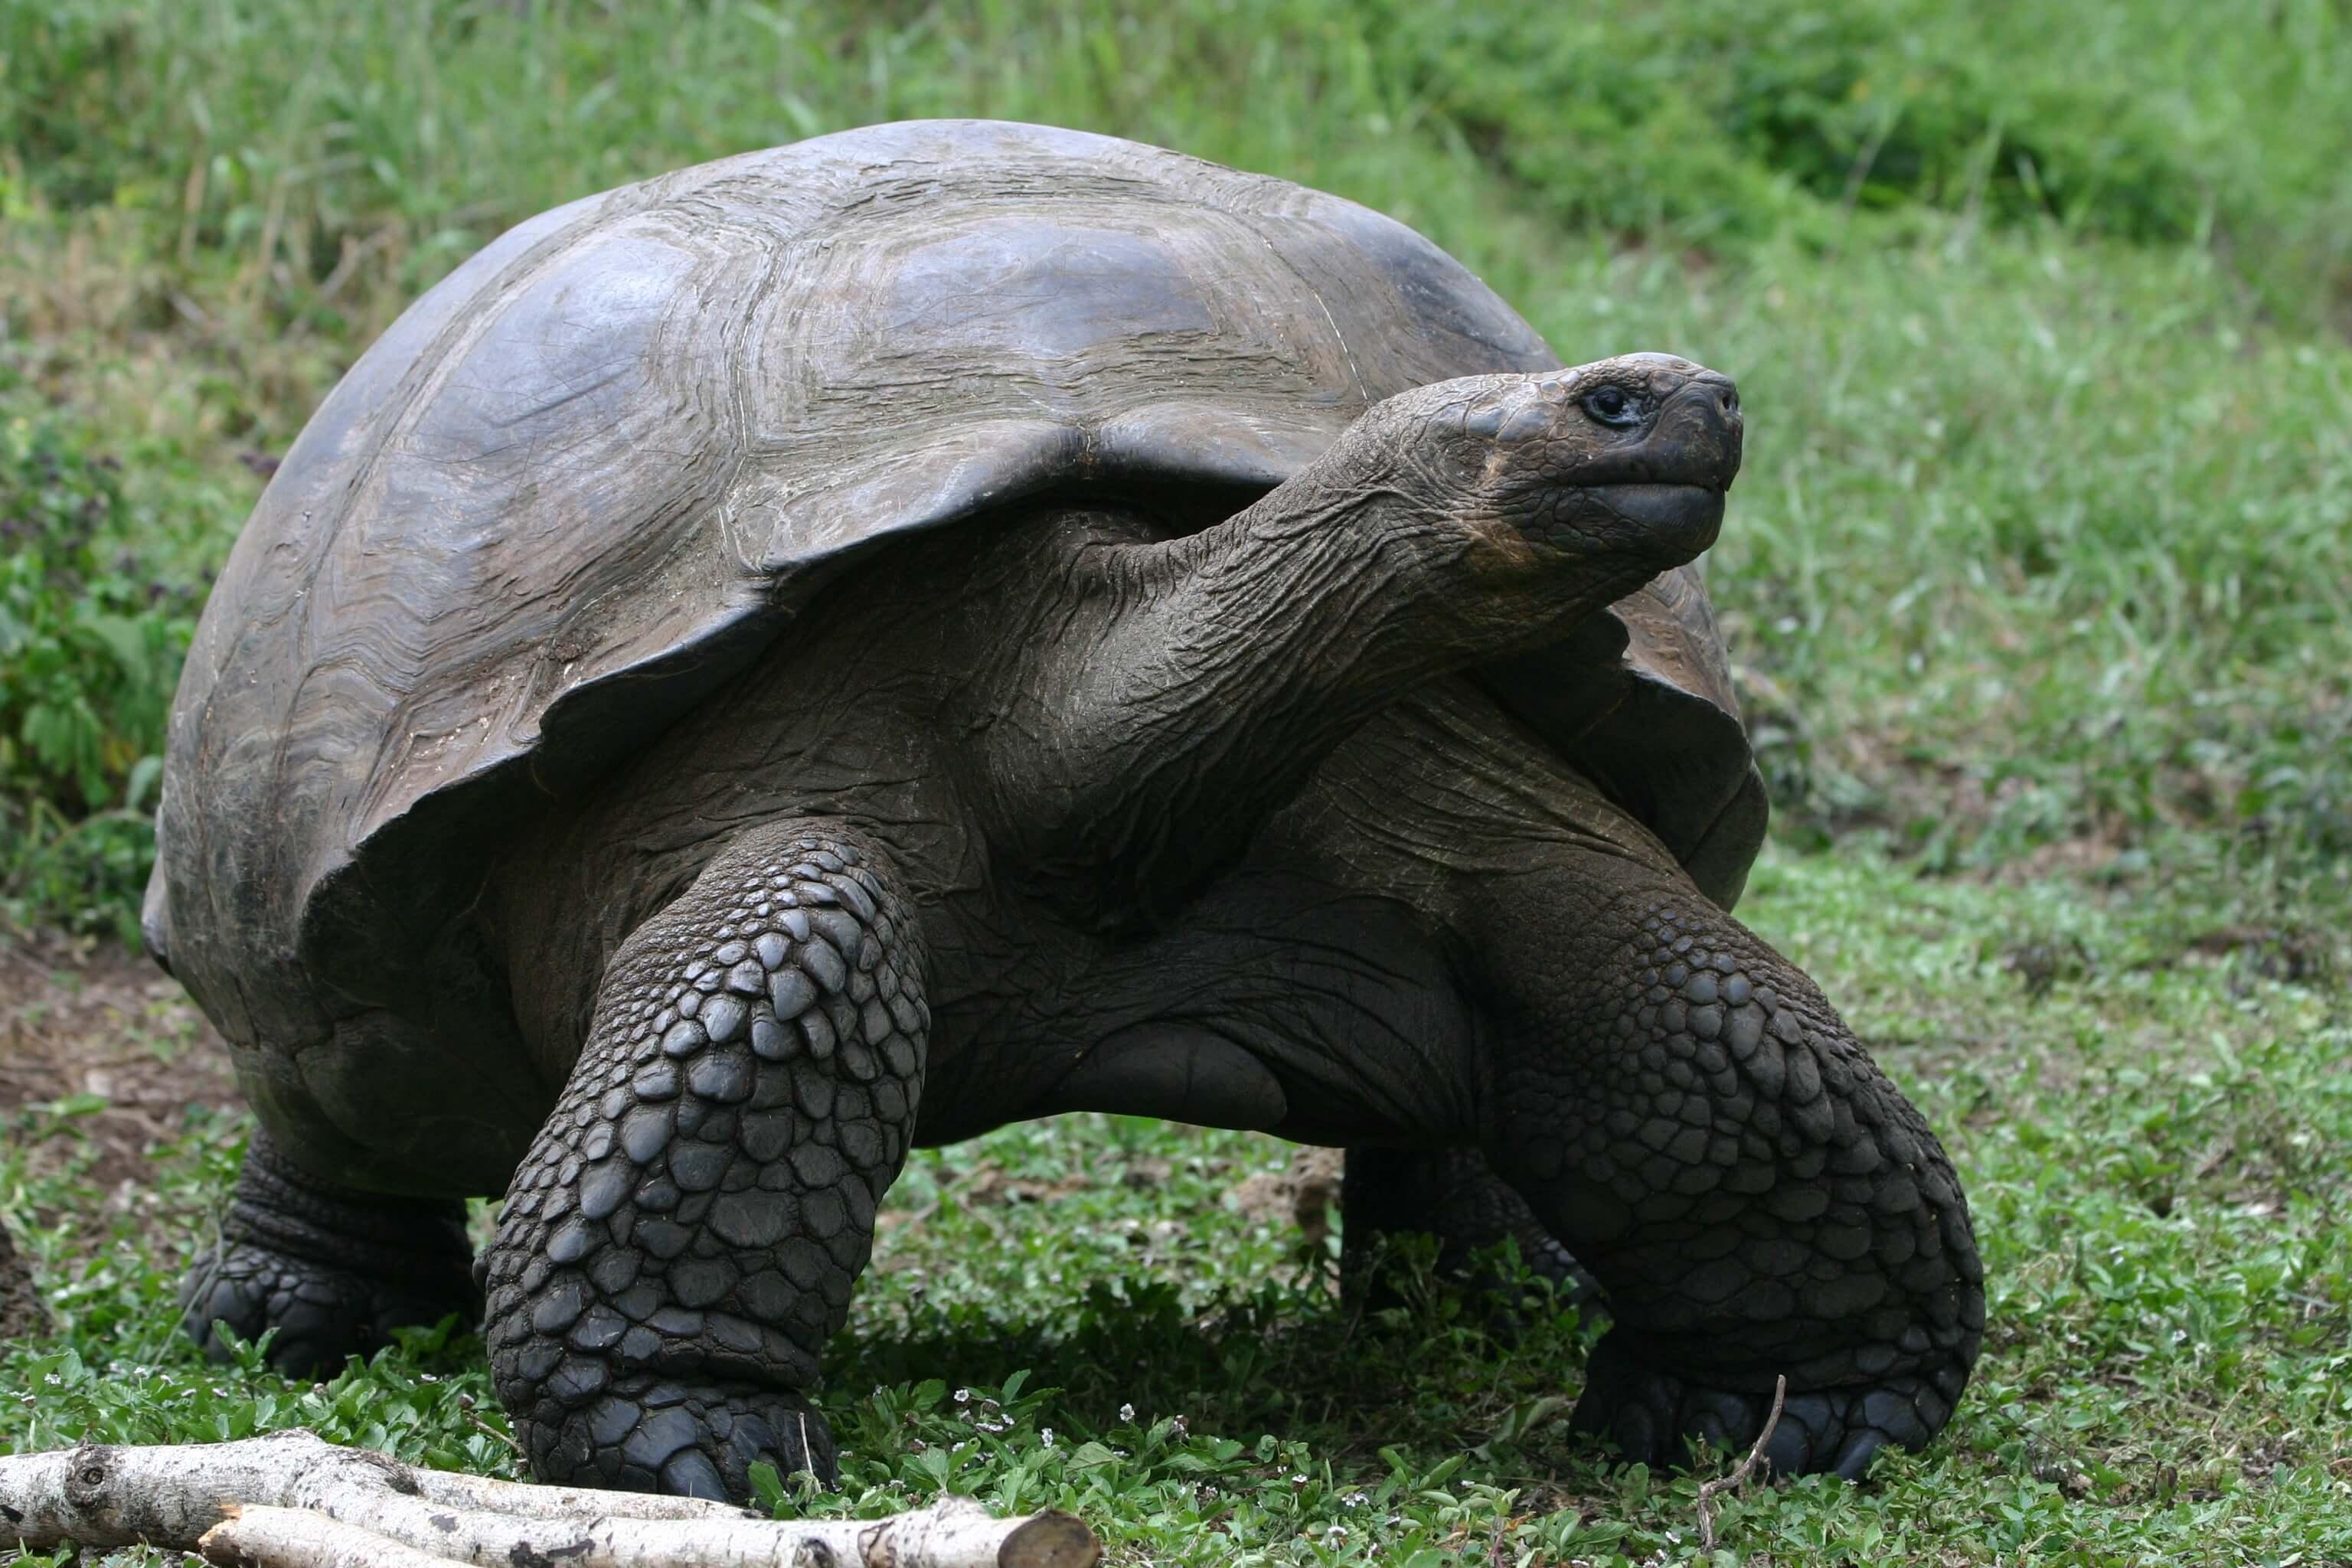 Tortoise by Vanessa Horwell